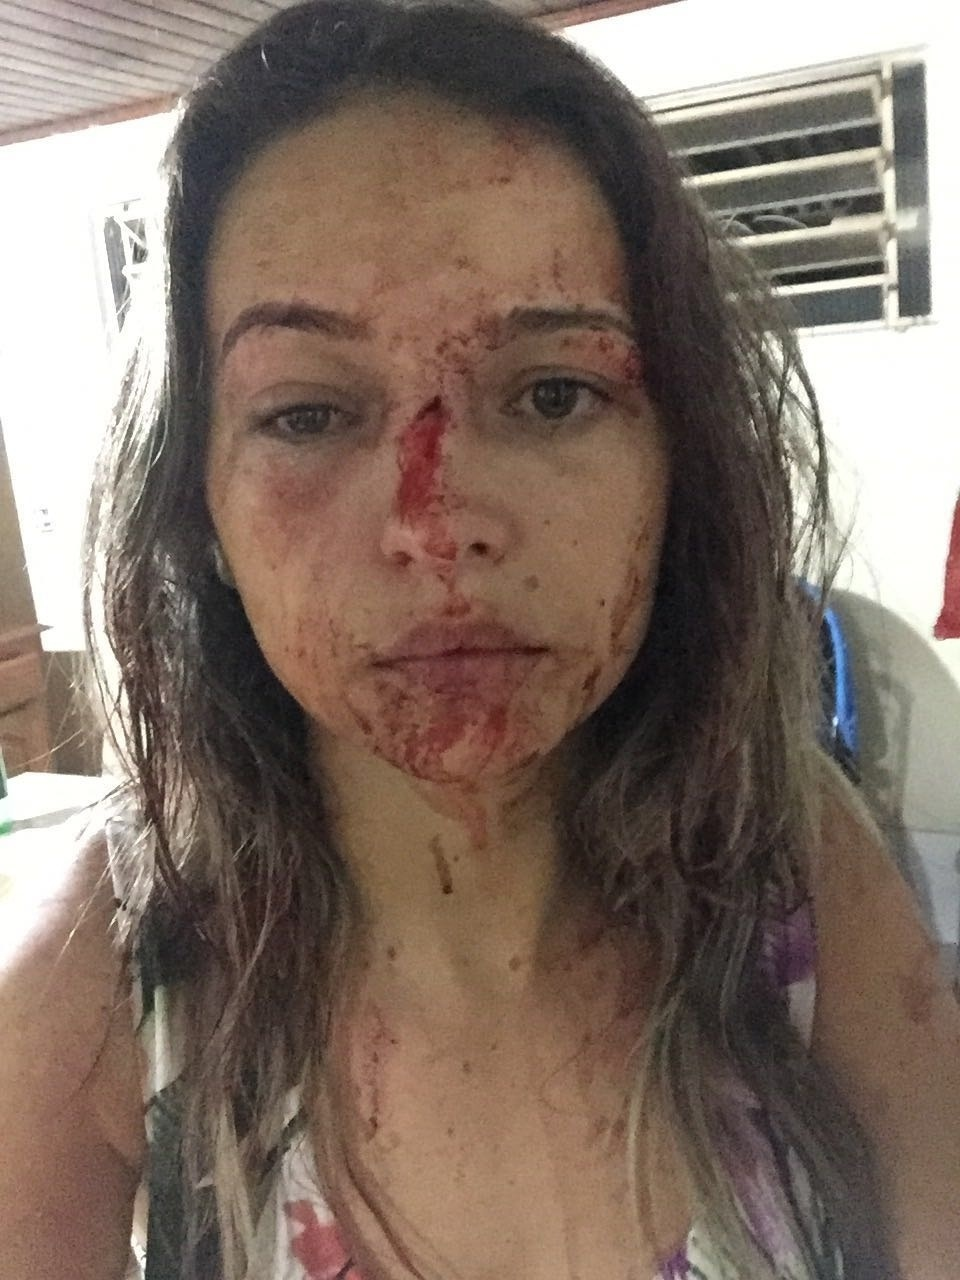 Pâmela Alves, que foi agredida pelo lutador de MMA Deroci Barbosa, no Acre